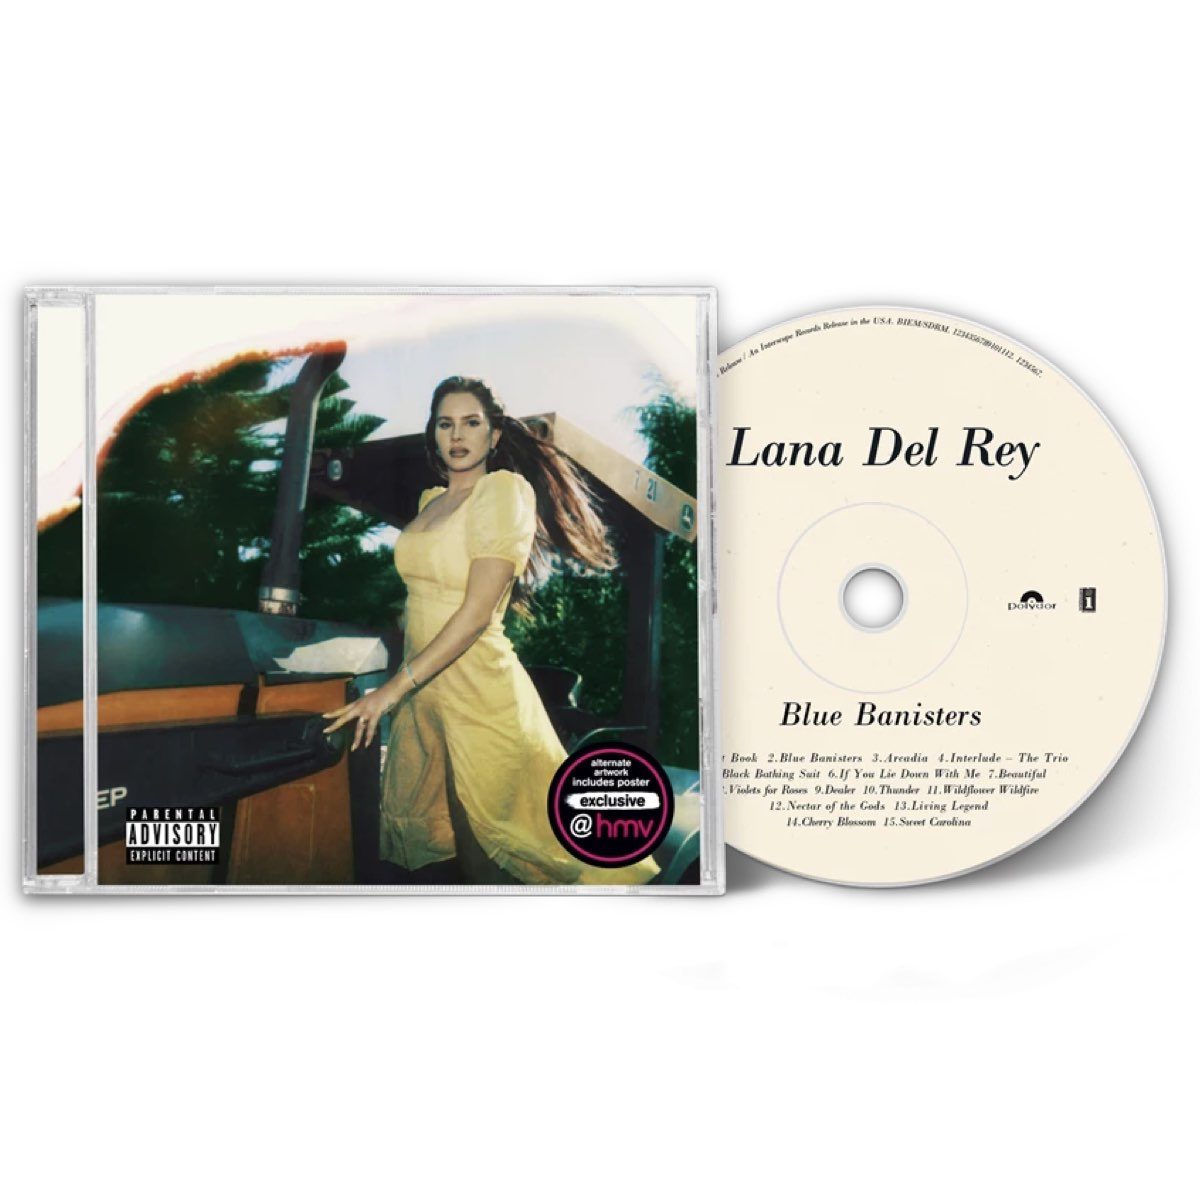 Lana Del Rey - Blue Banisters [HMV Exclusive - Limited Edition - Capa Alternativa] - CD